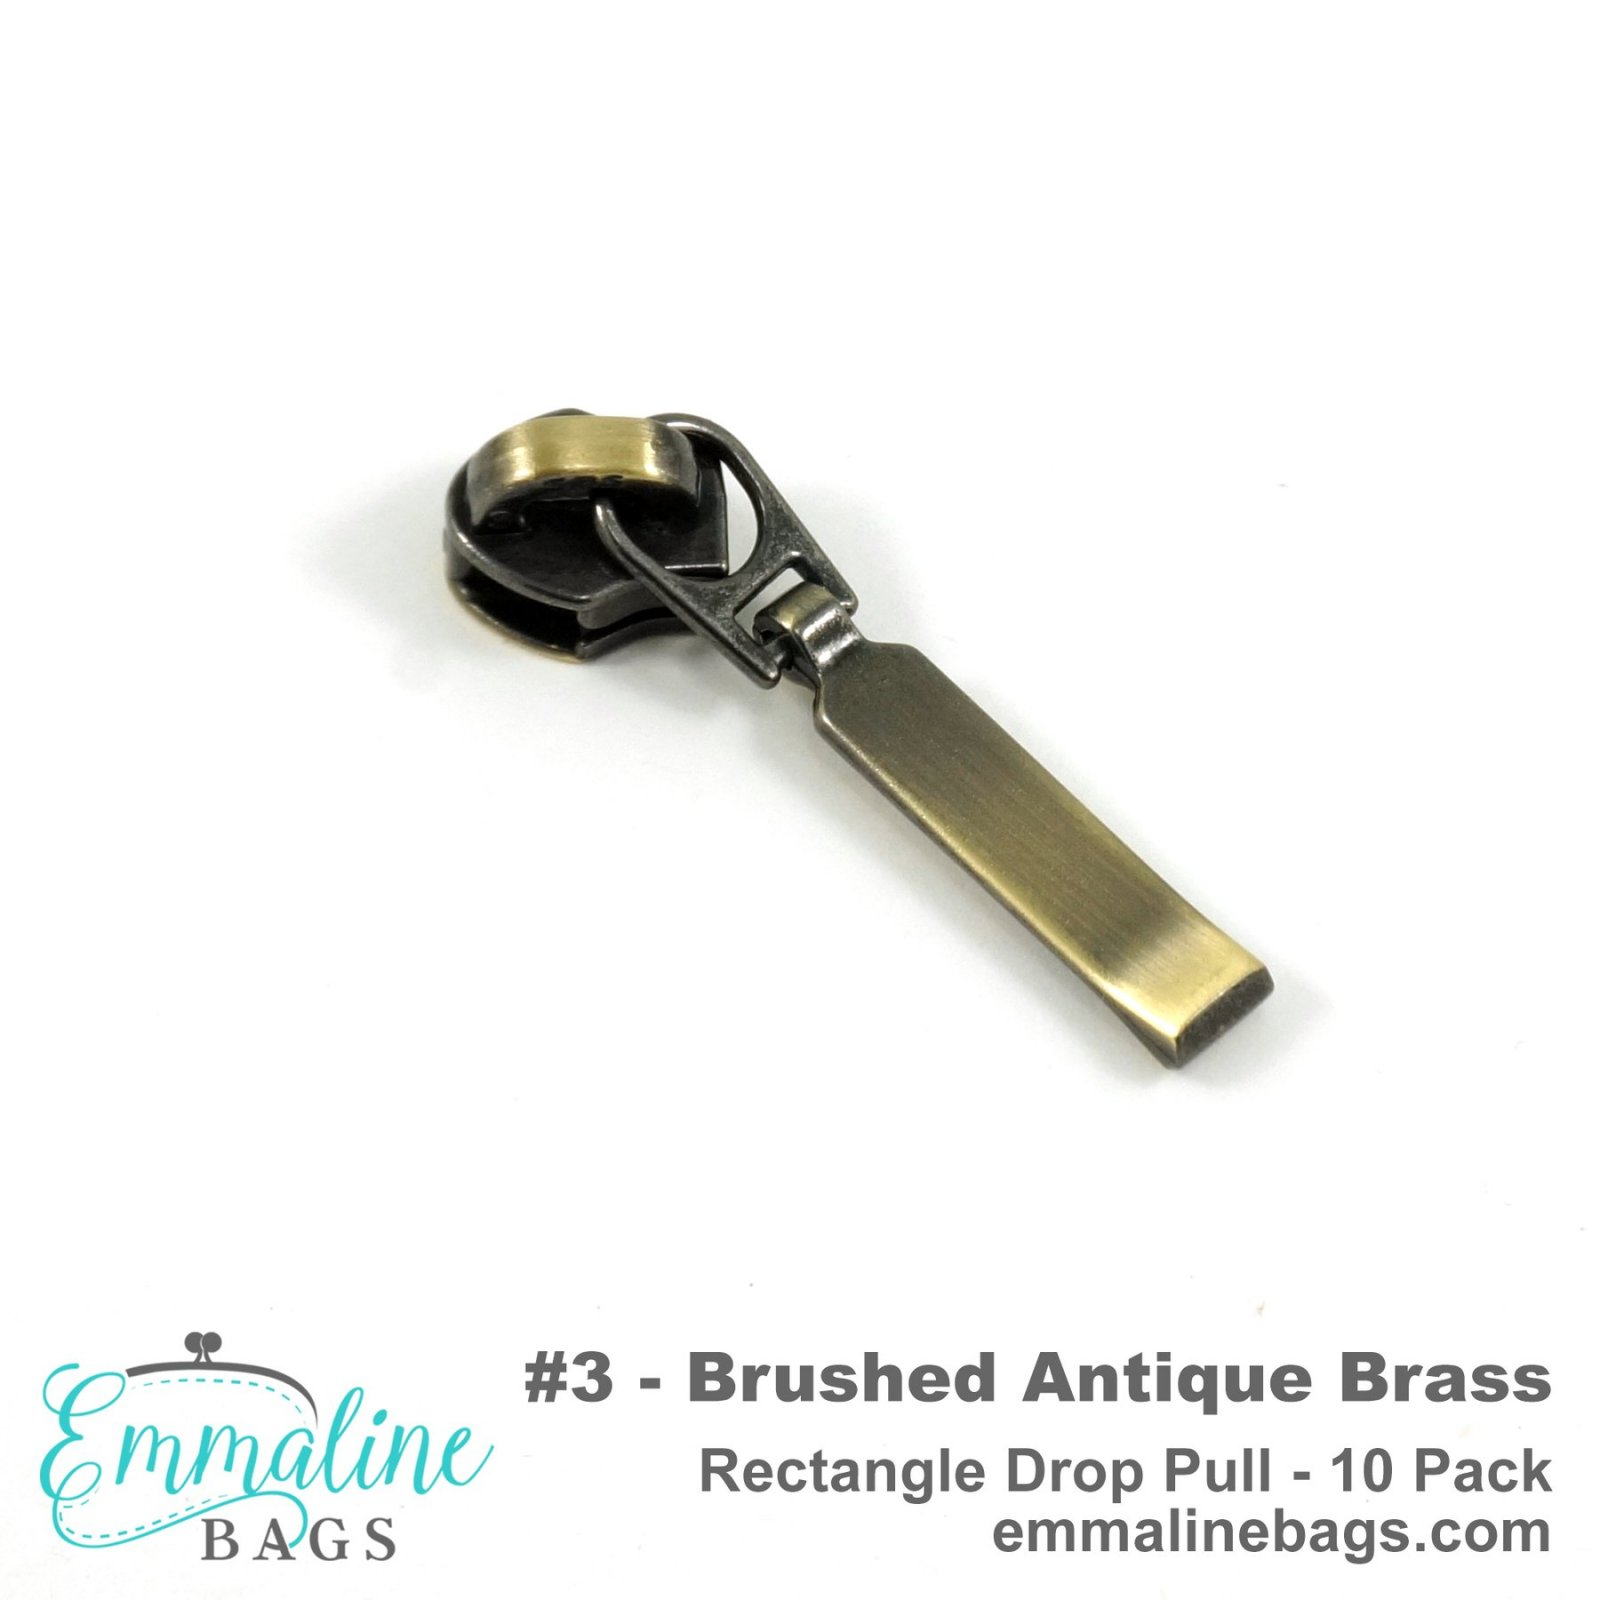 Zipper Sliders with Pulls #3 Antique Brass